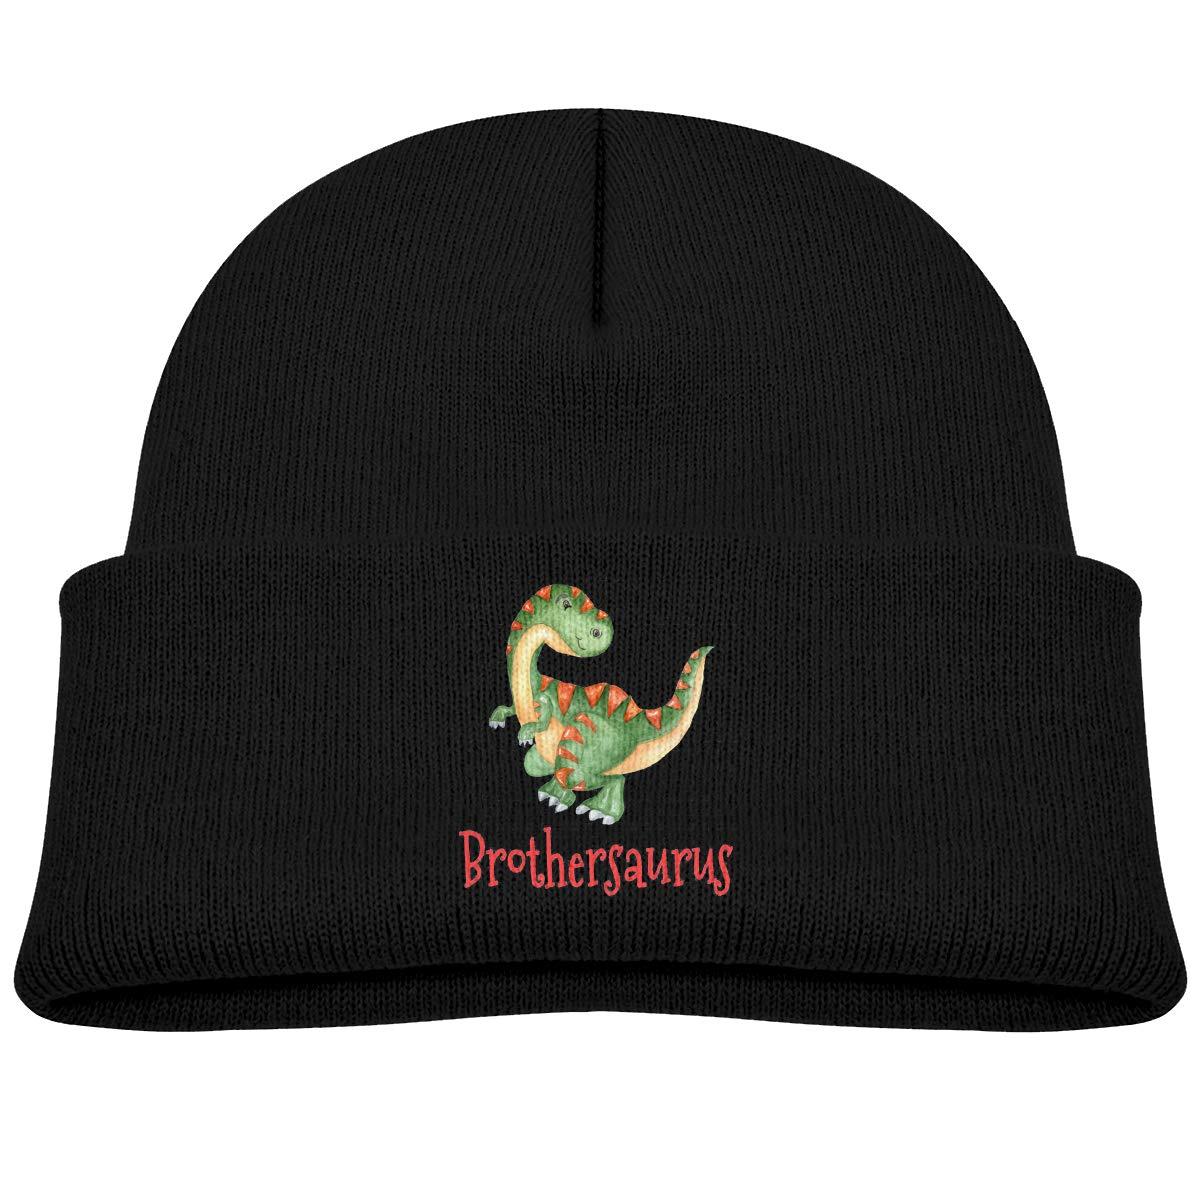 Brothersaurus Knitted Hat Classic Skull Beanies Boys Girls Cuffed Plain Cap